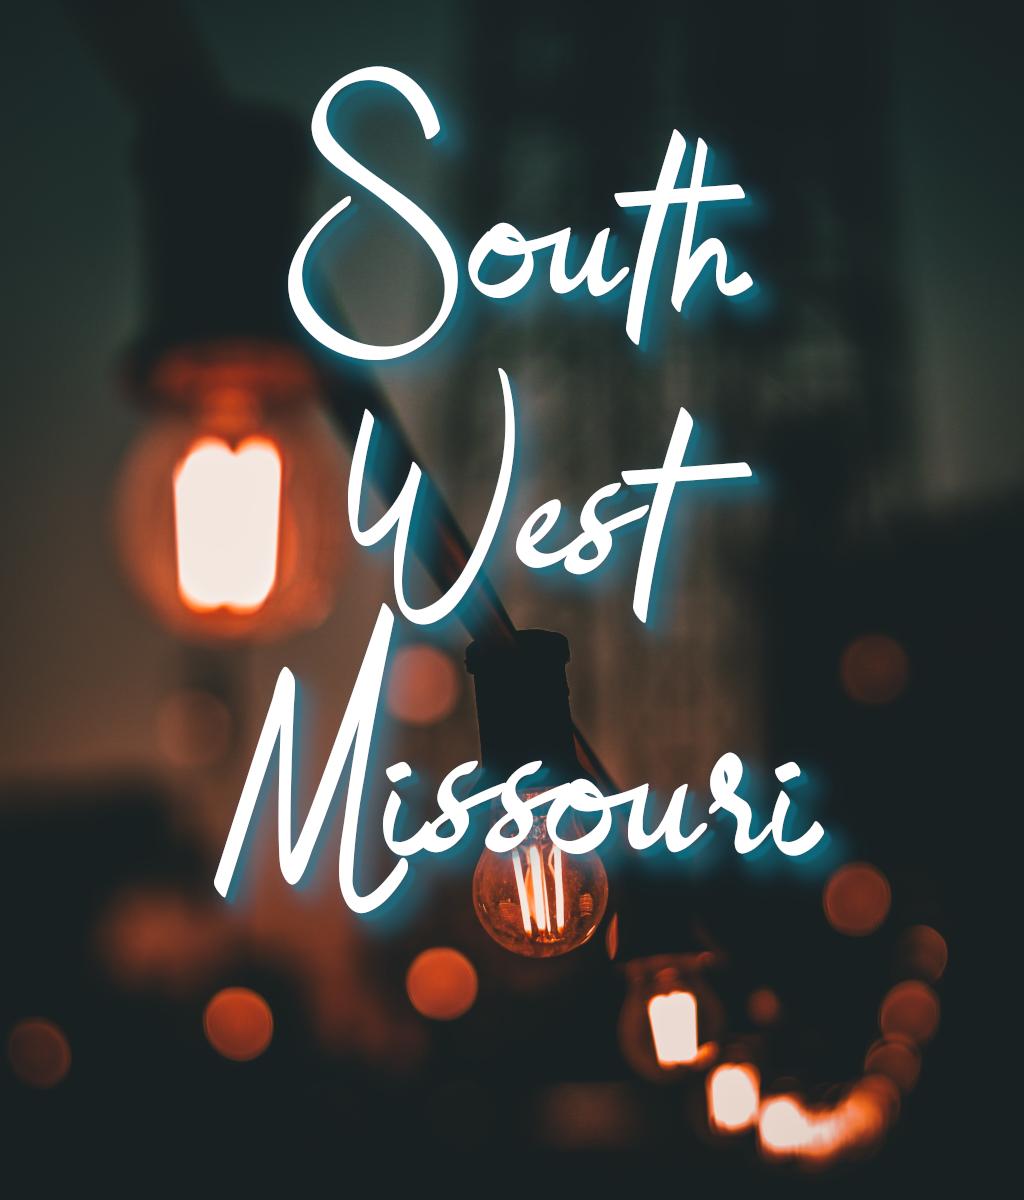 South West Misouri Apartments - Live Affiniti Locations